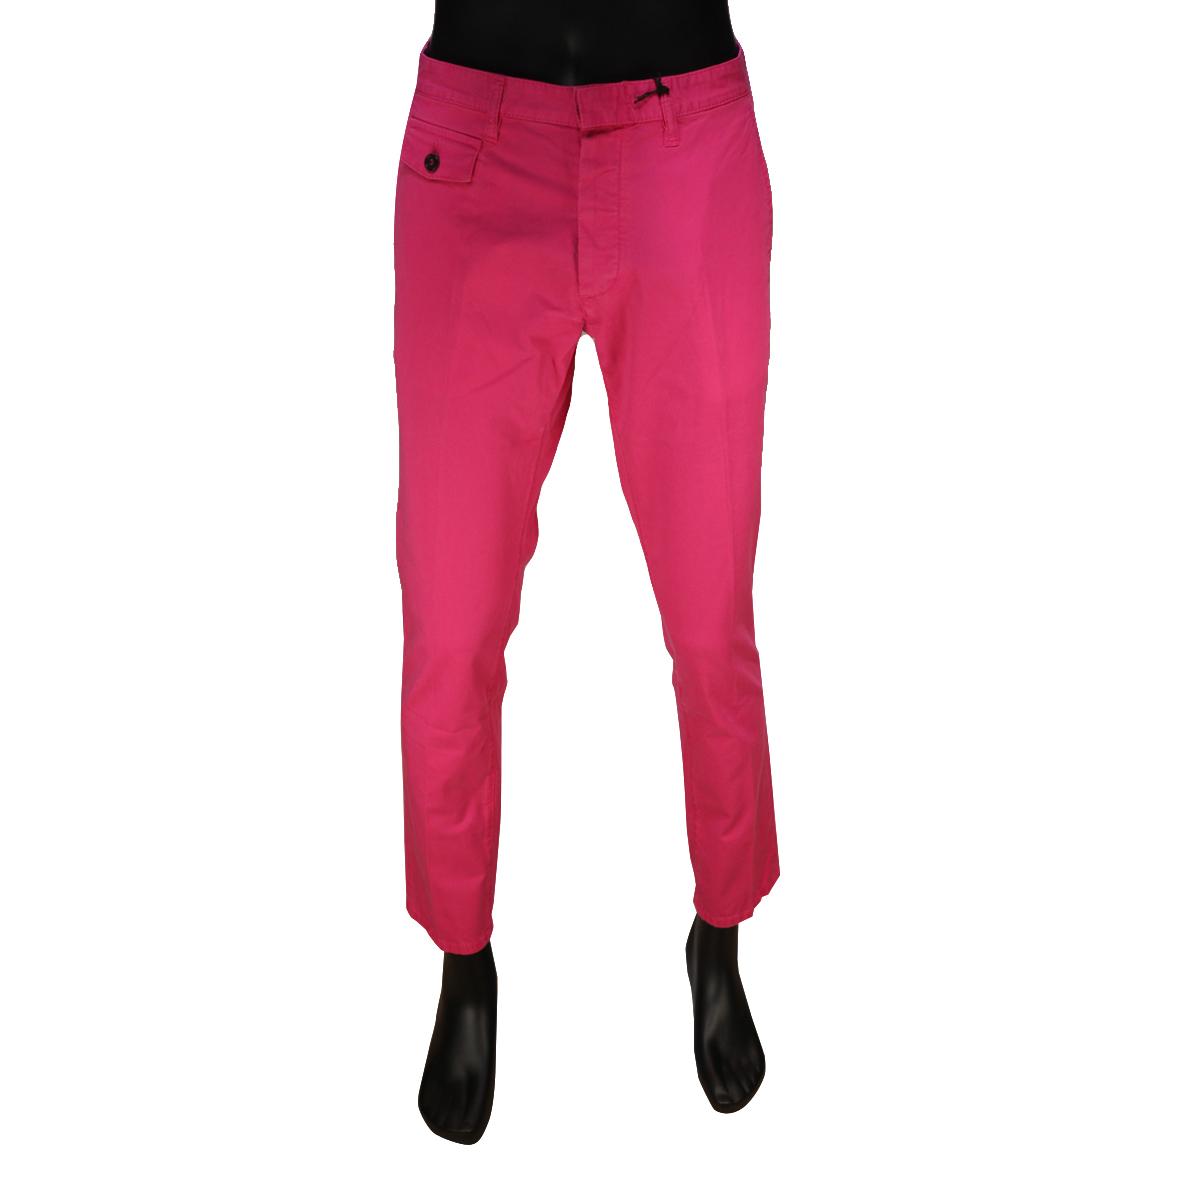 Повседневные брюки DSquared2 s71ka0626